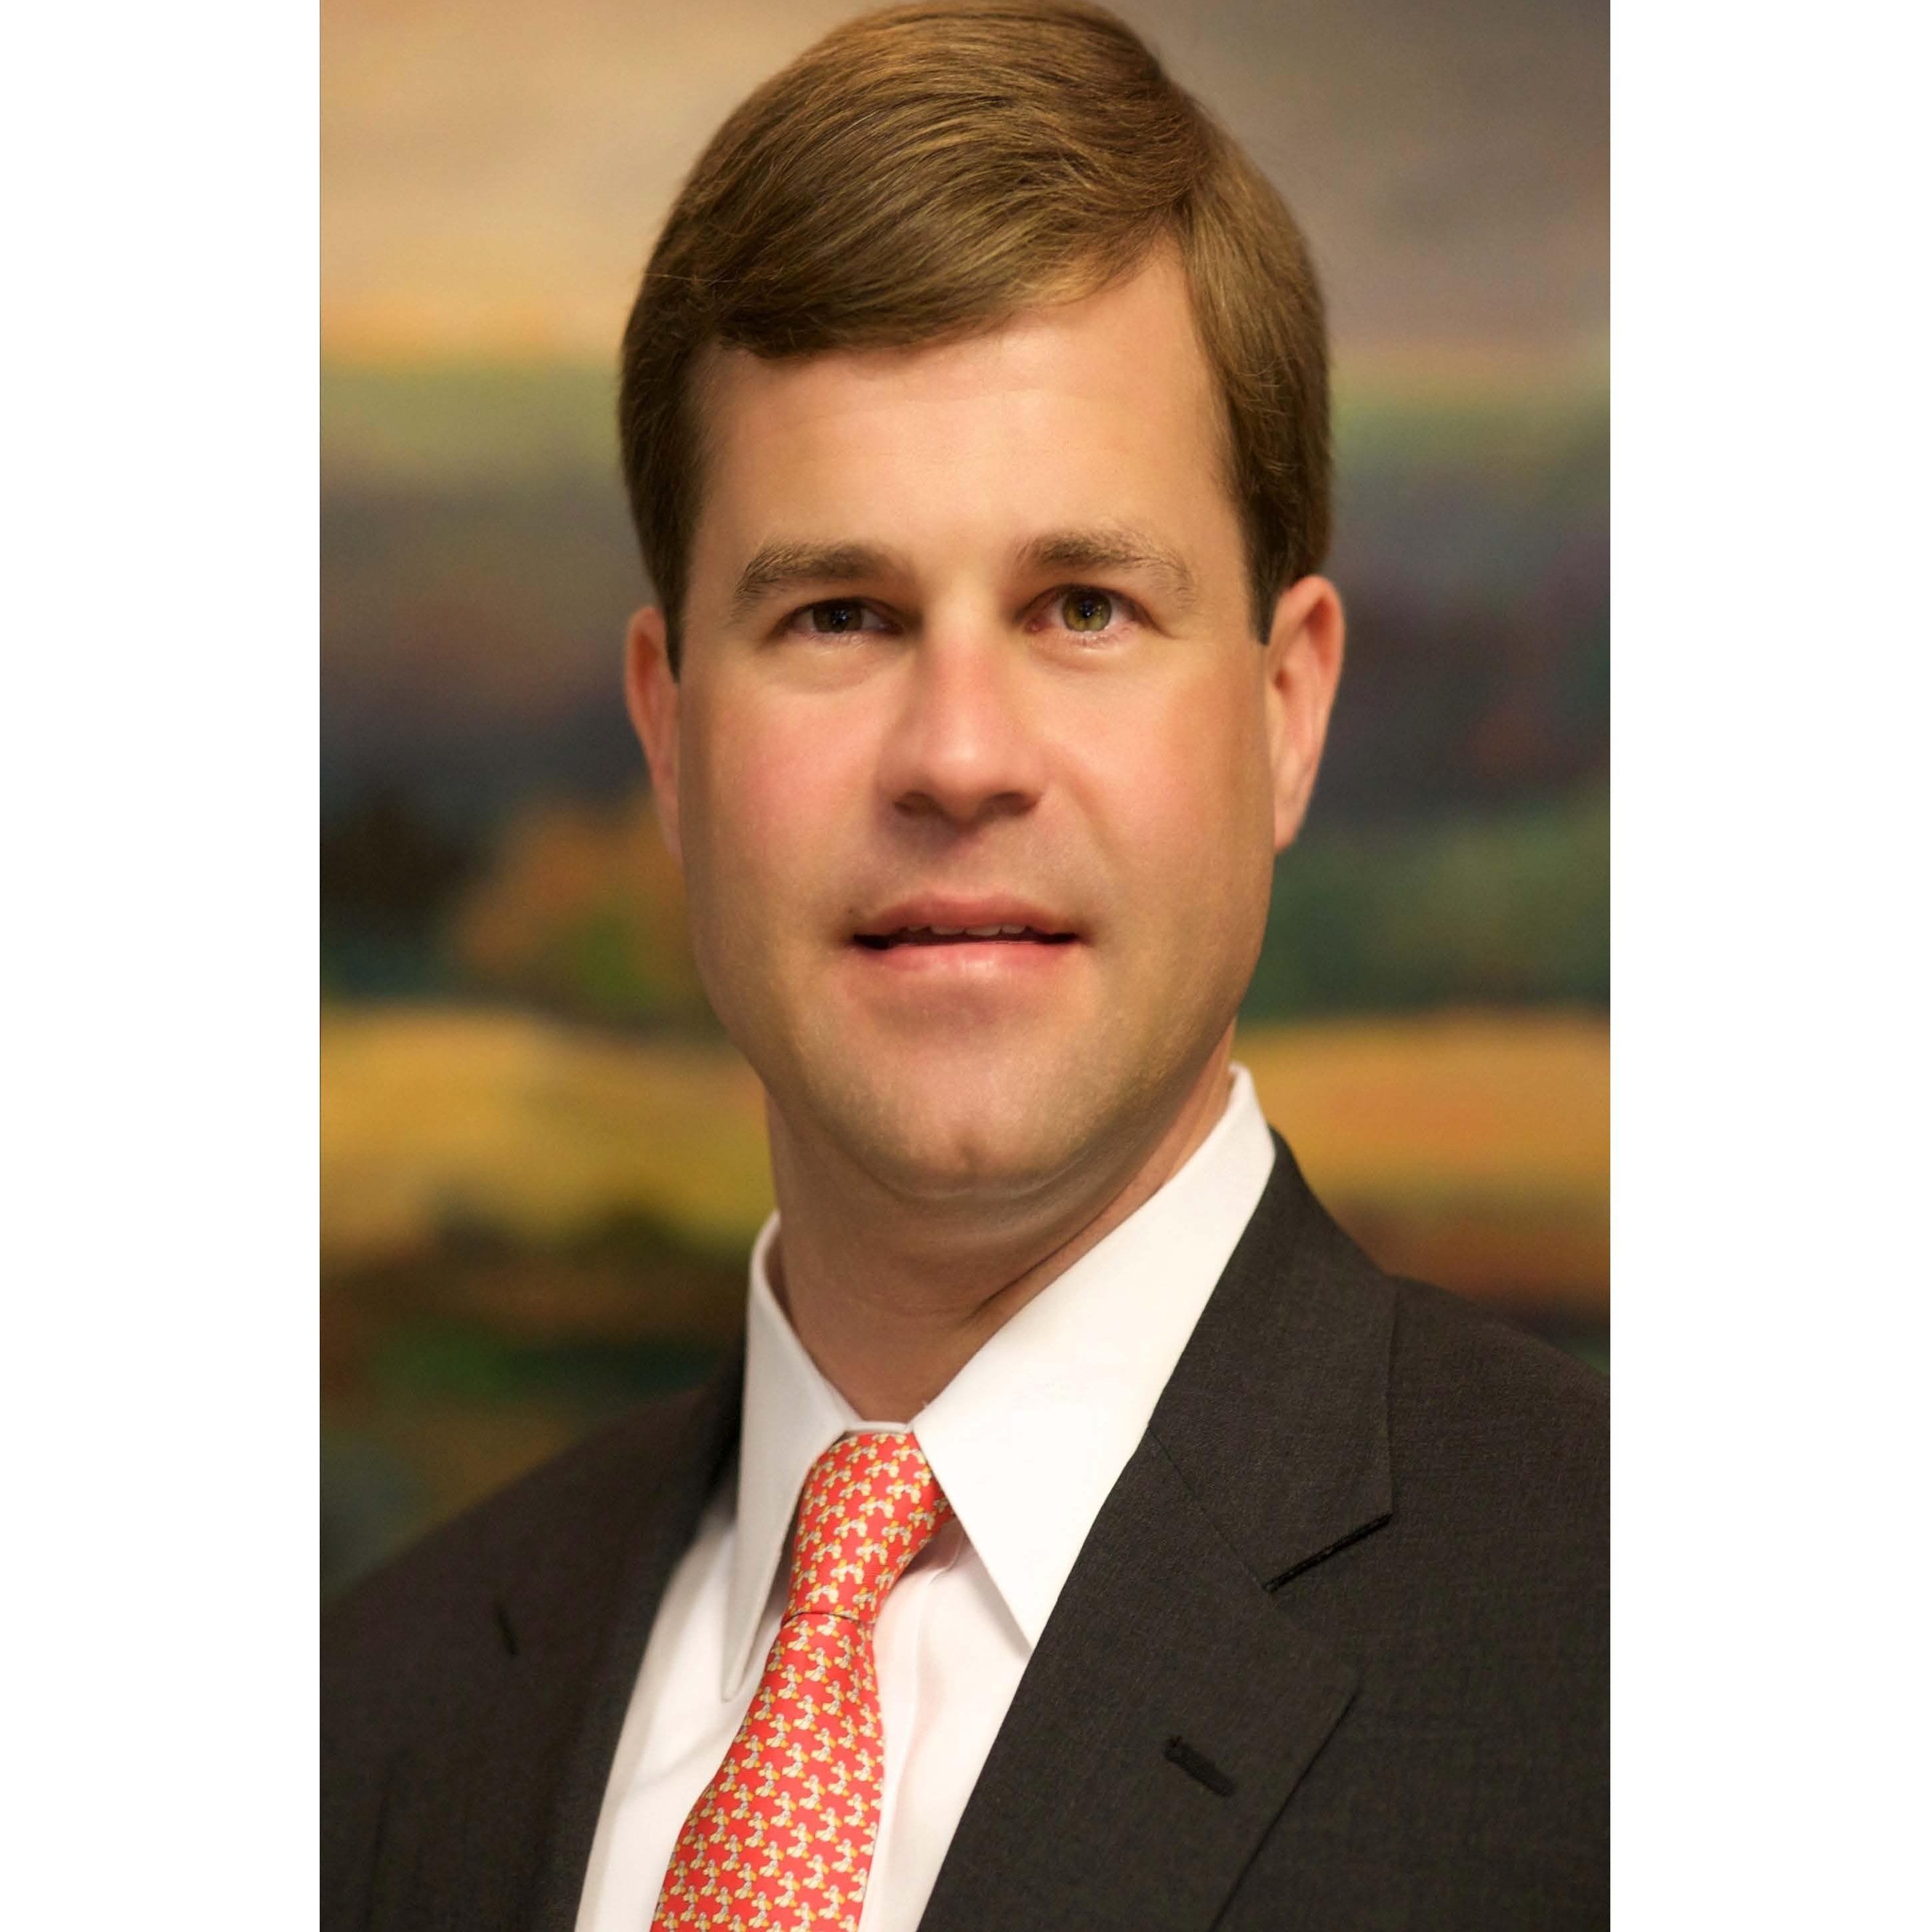 Mortgage Lender in GA Atlanta 30305 IBERIABANK Mortgage: Edwin Padgett 2970 Peachtree Road NW  (678)589-4208